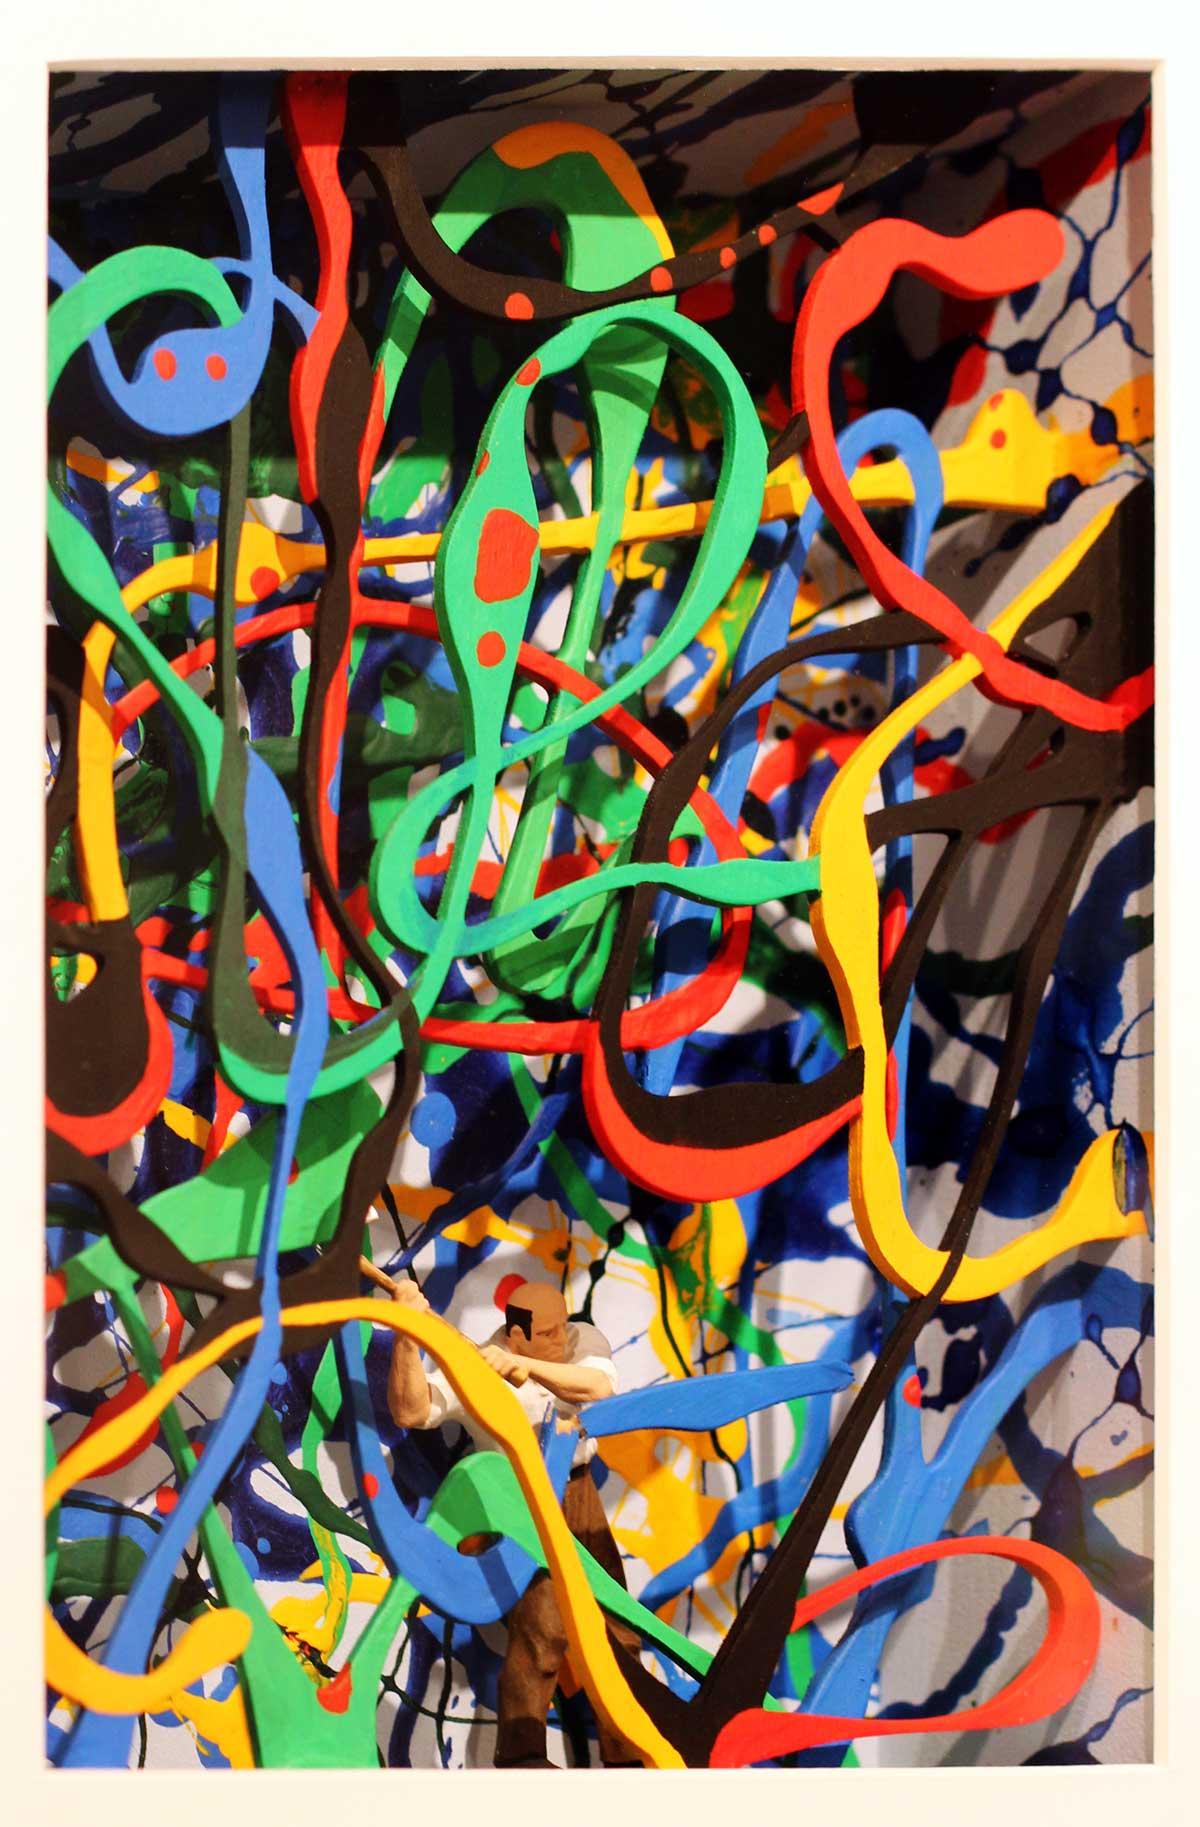 Volker Kühn - hommage à Pollock - Art in Boxes